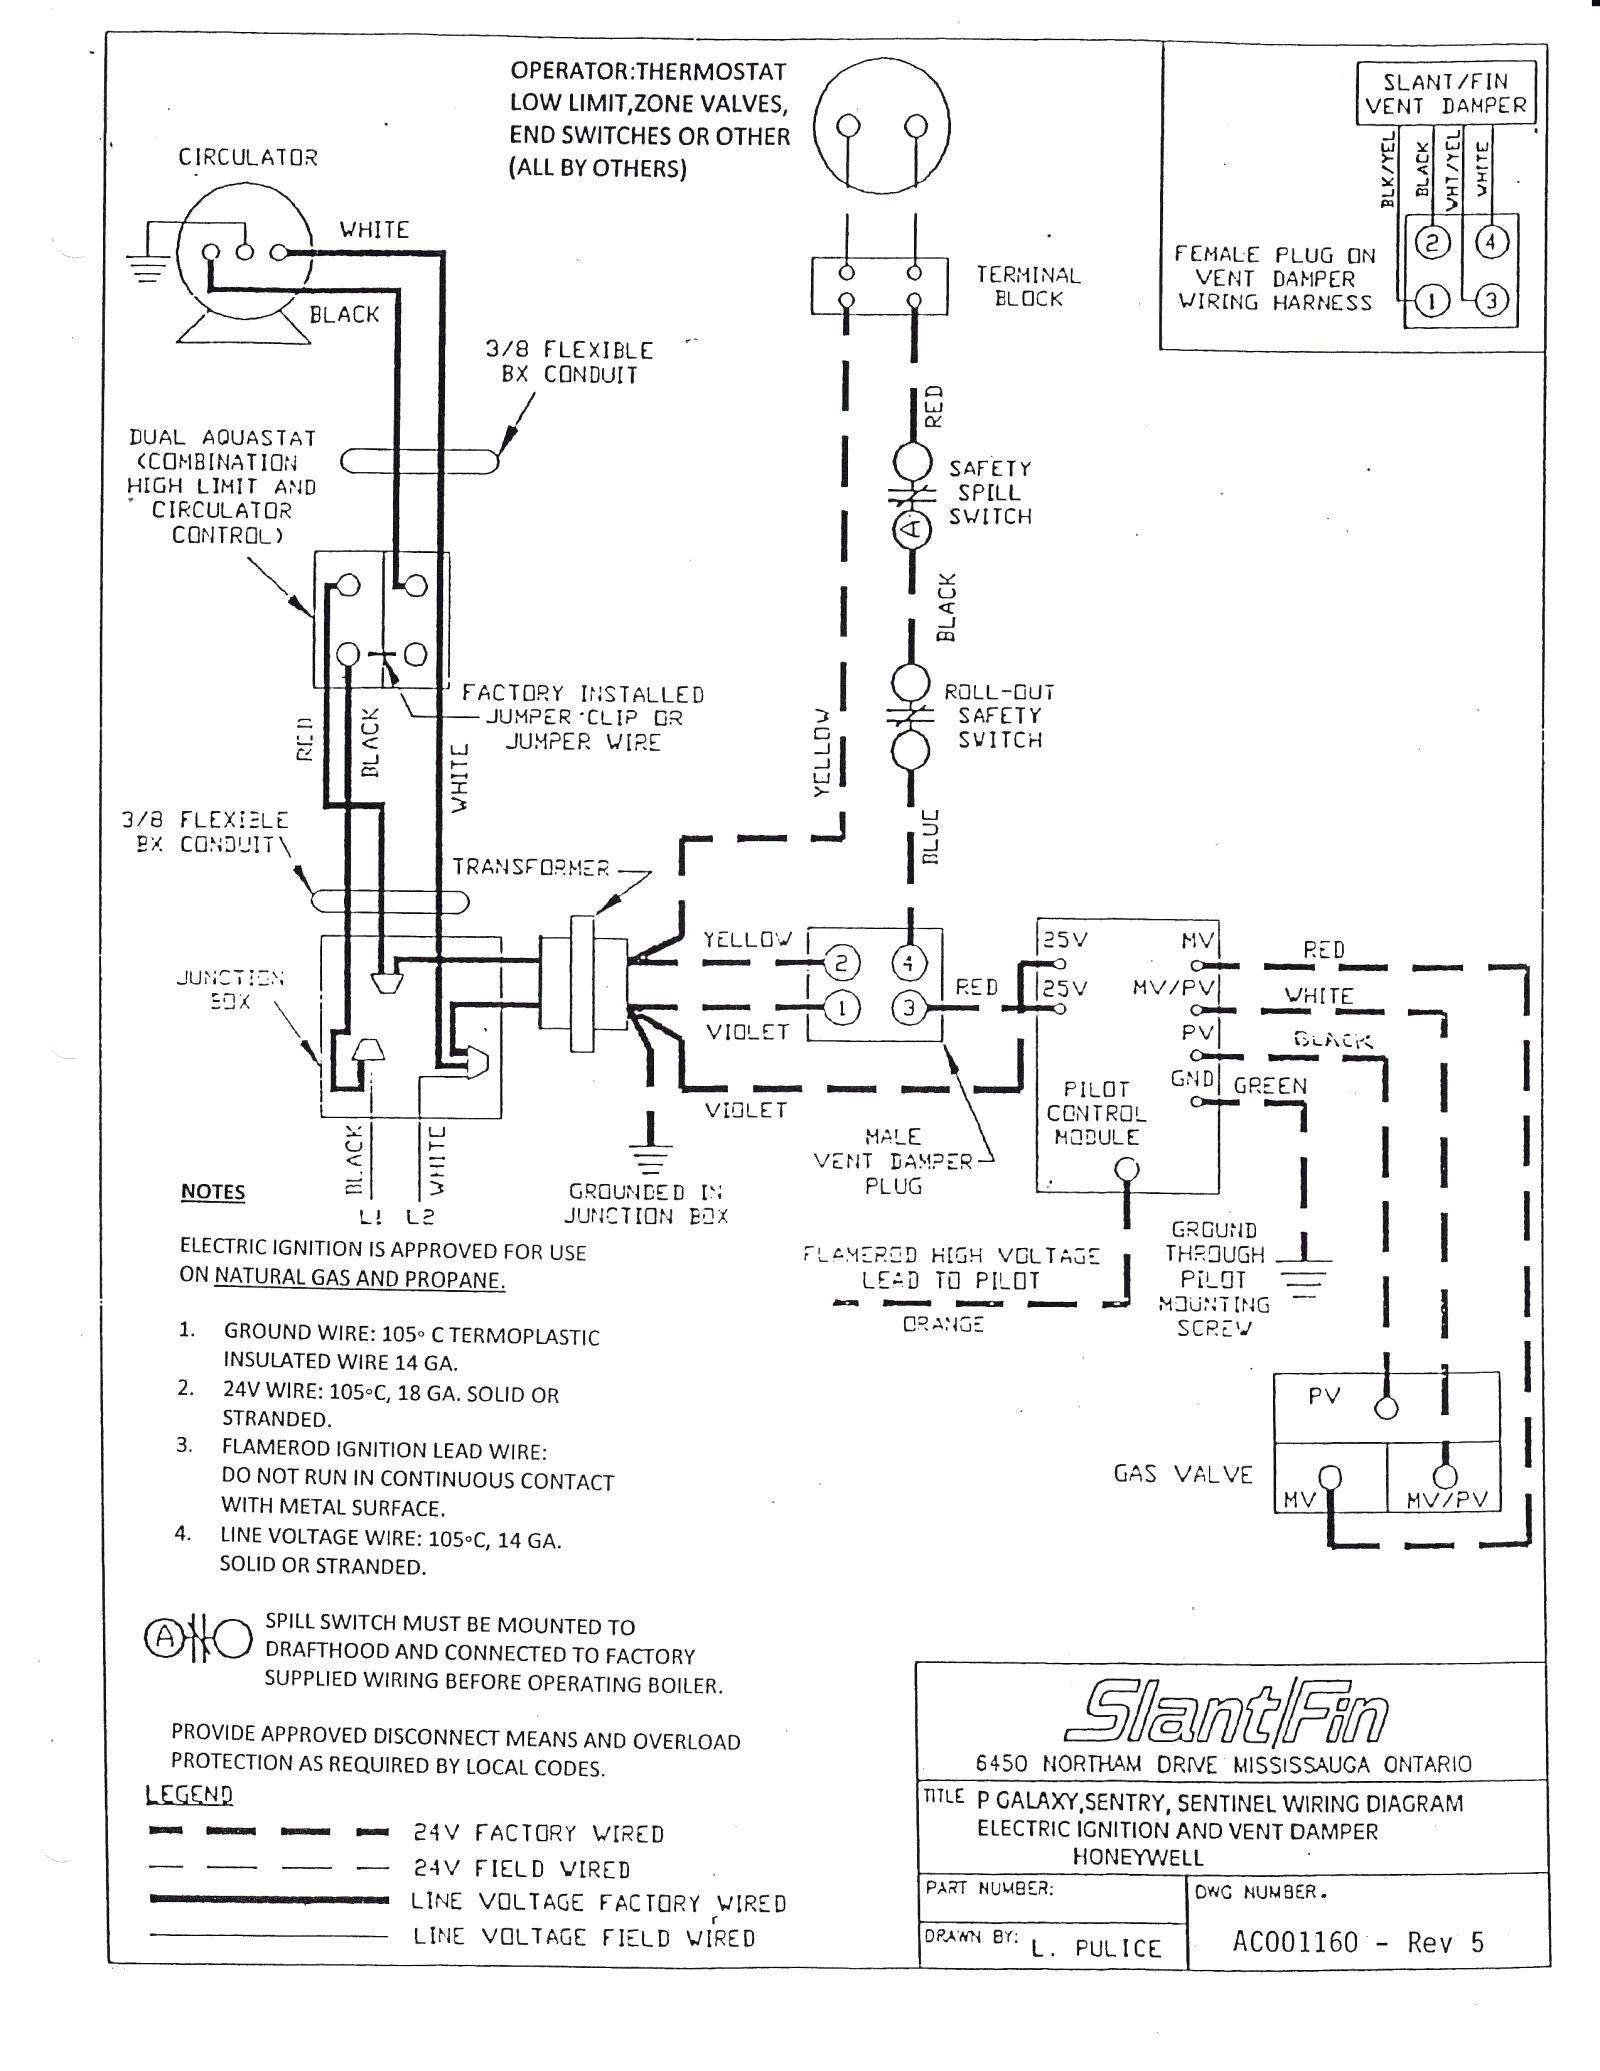 aquastat relay type l8148e wiring diagram for boiler great wood dump zone free diagrams aquastat relay type l8148e wiring diagram